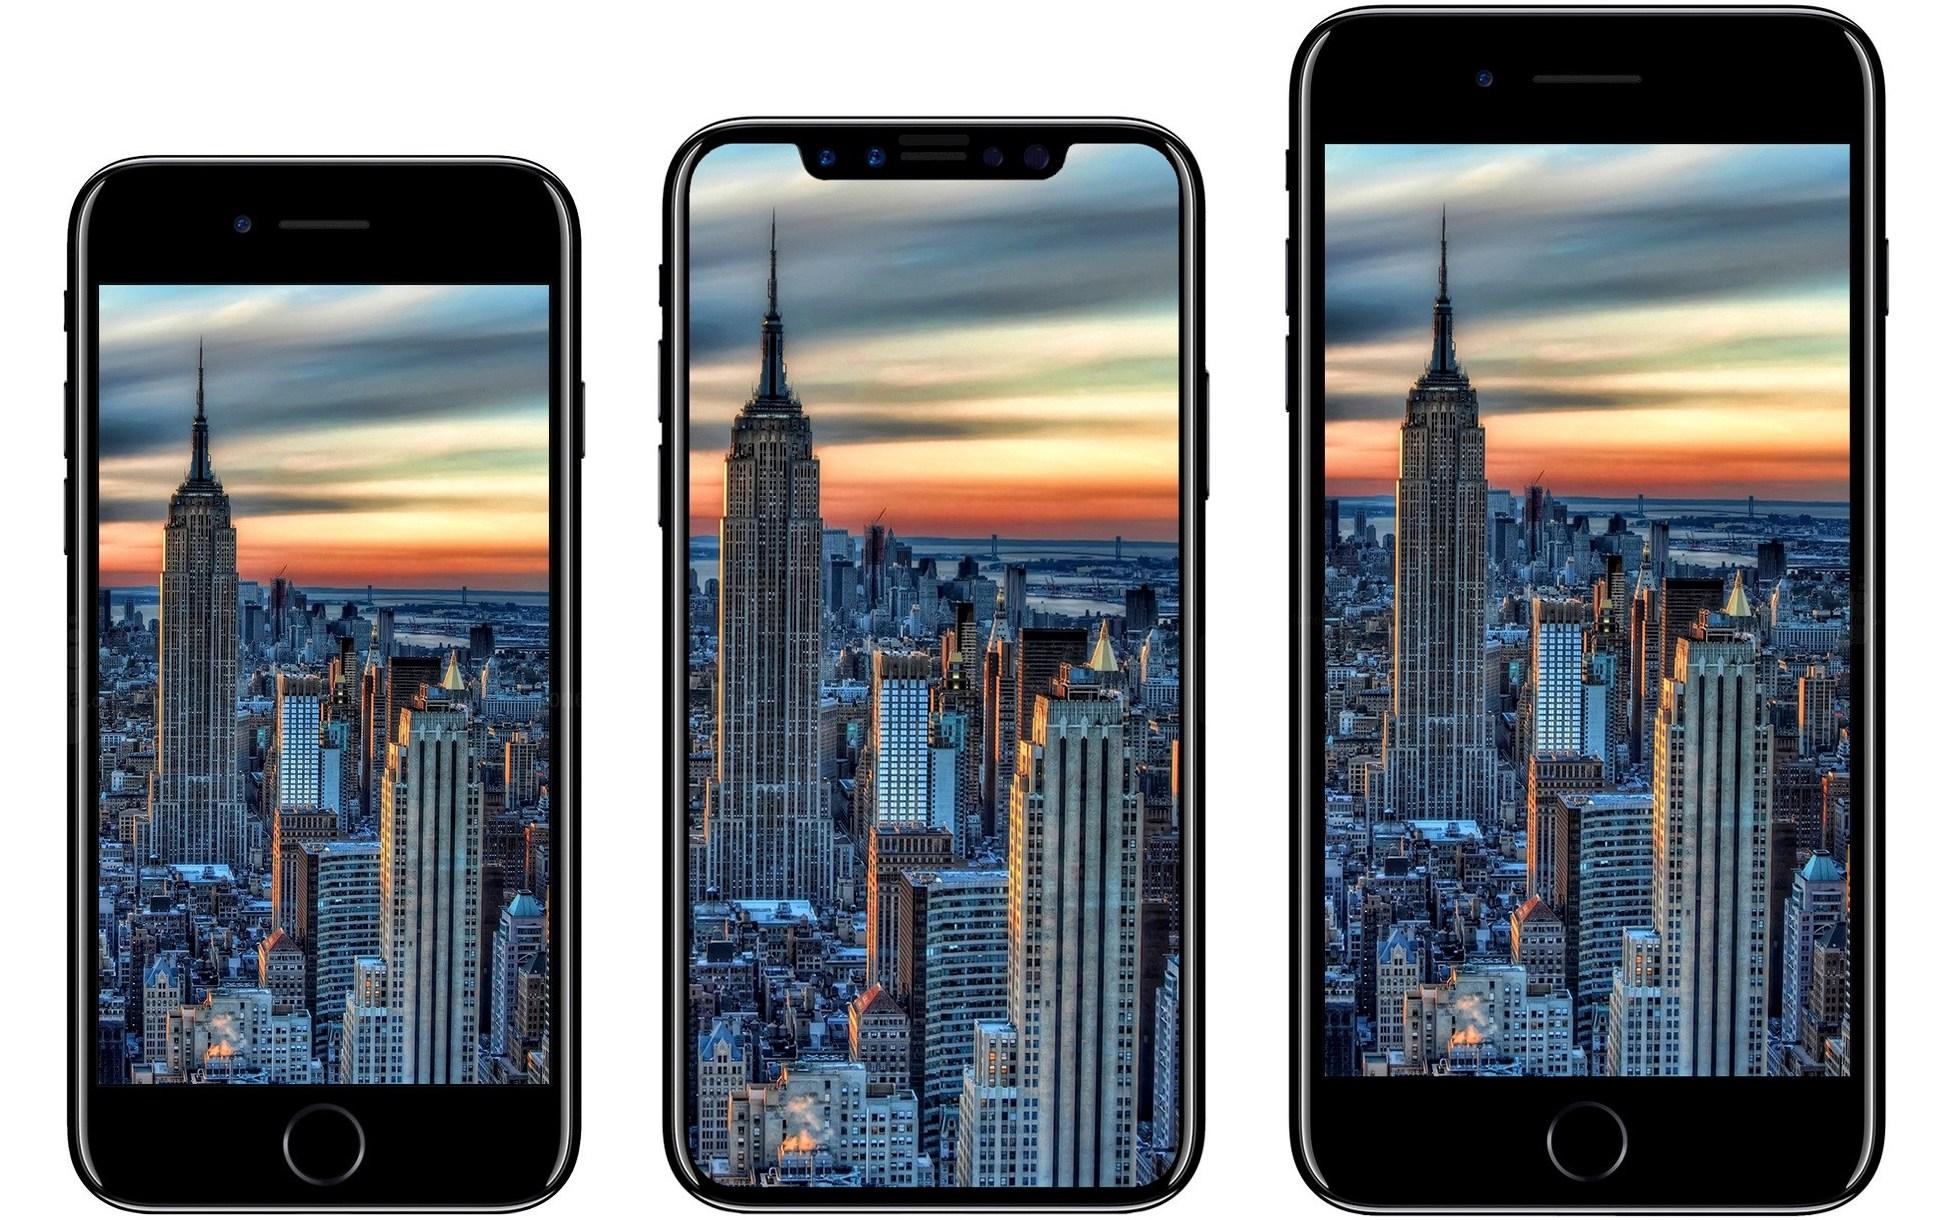 iPhone 8 em Portugal poderá custar 1149 euros - Pplware 3c524f2996